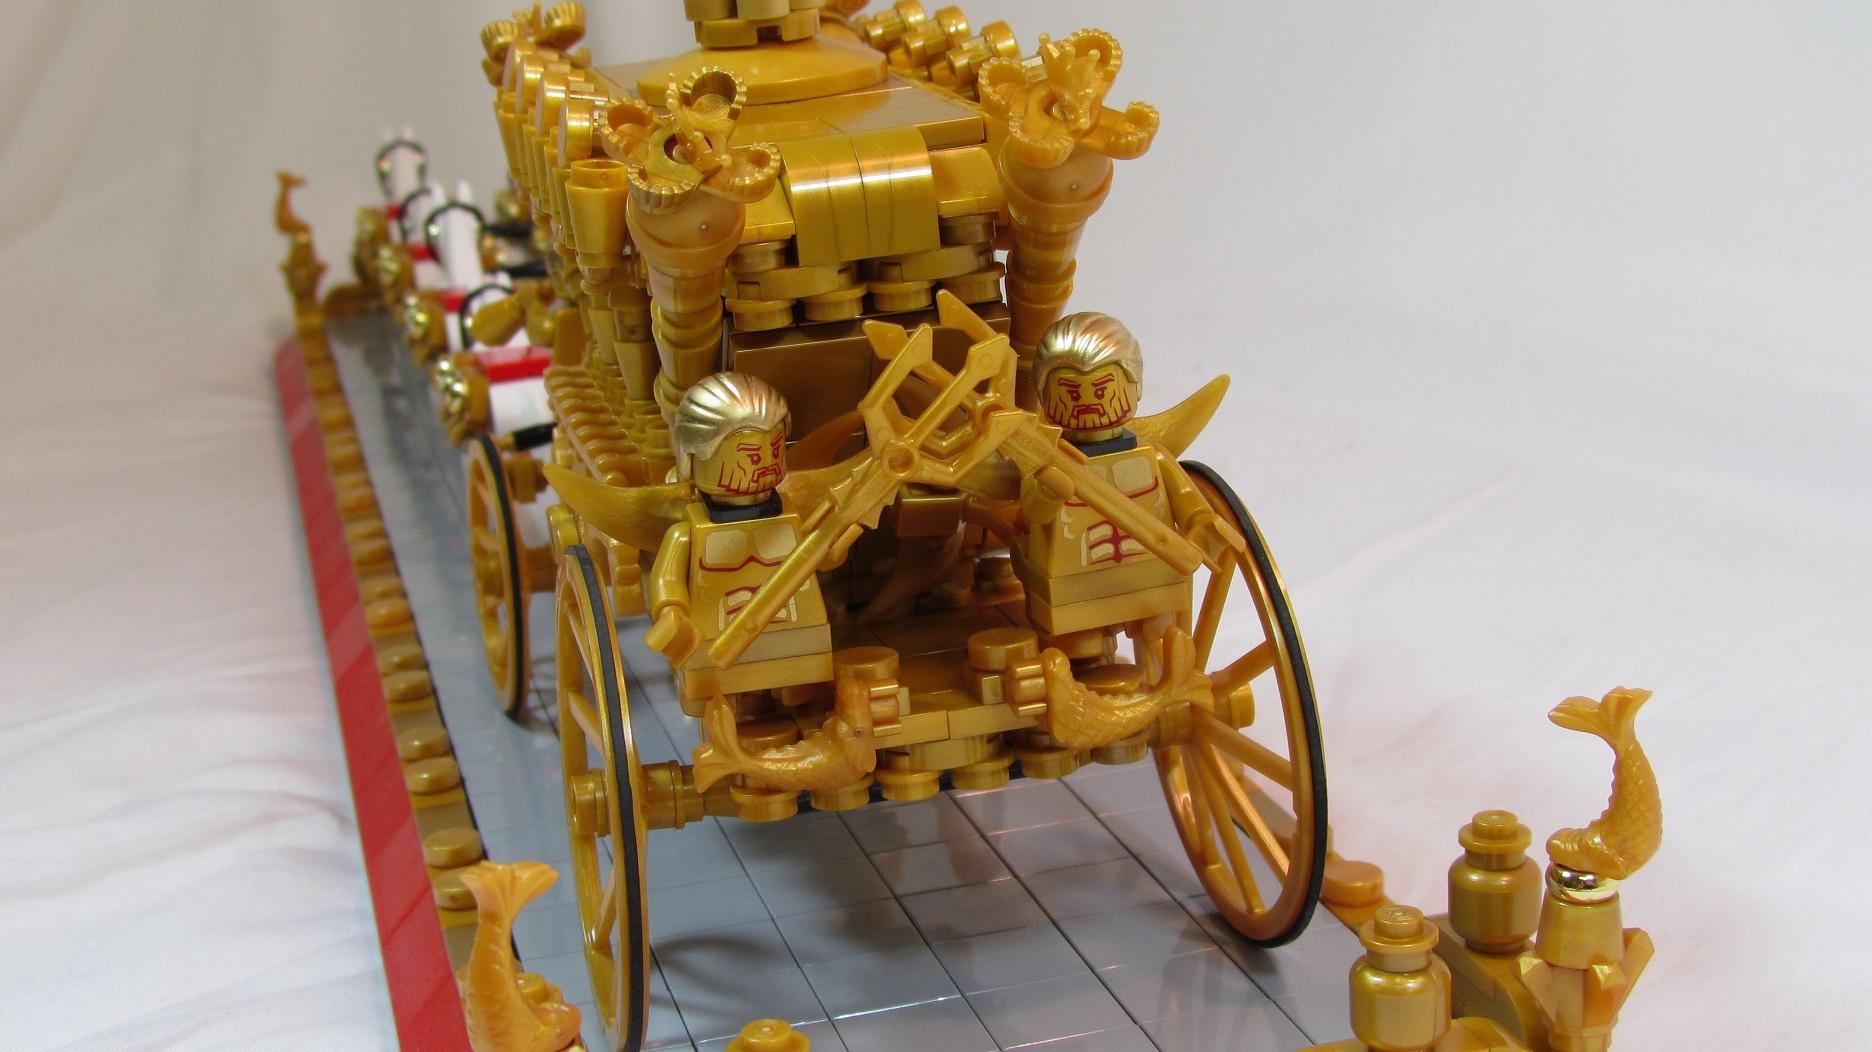 LEGO IDEAS - Queen Elizabeth II & the Gold State Coach